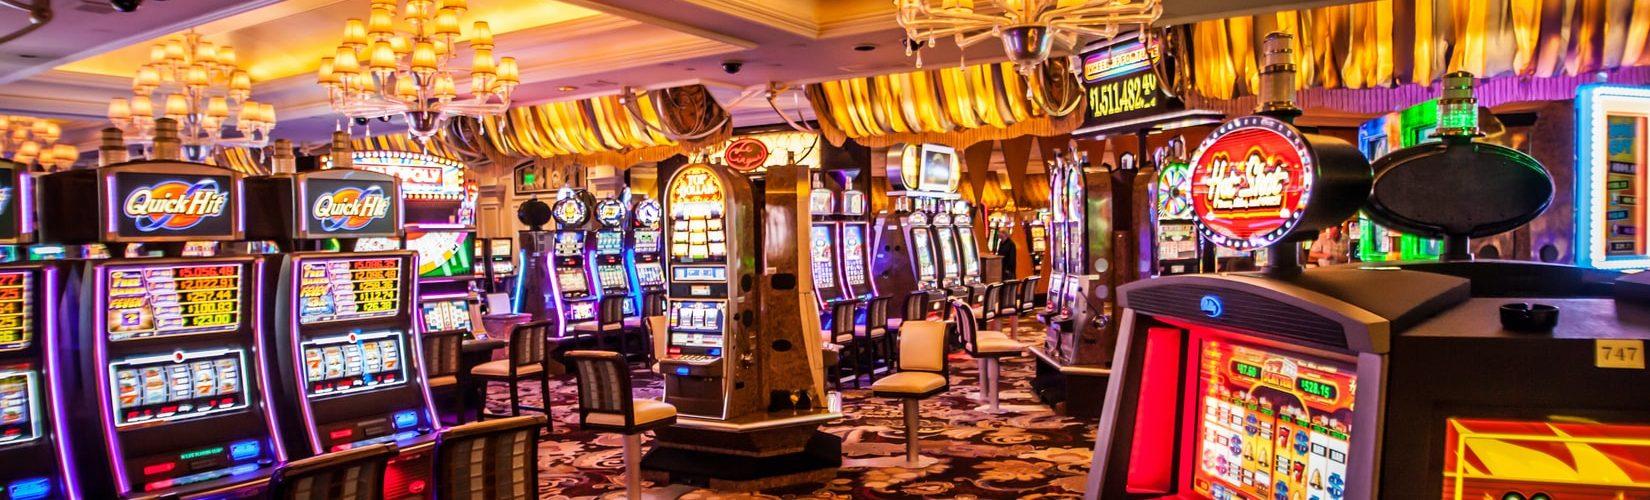 casino-las-vegas